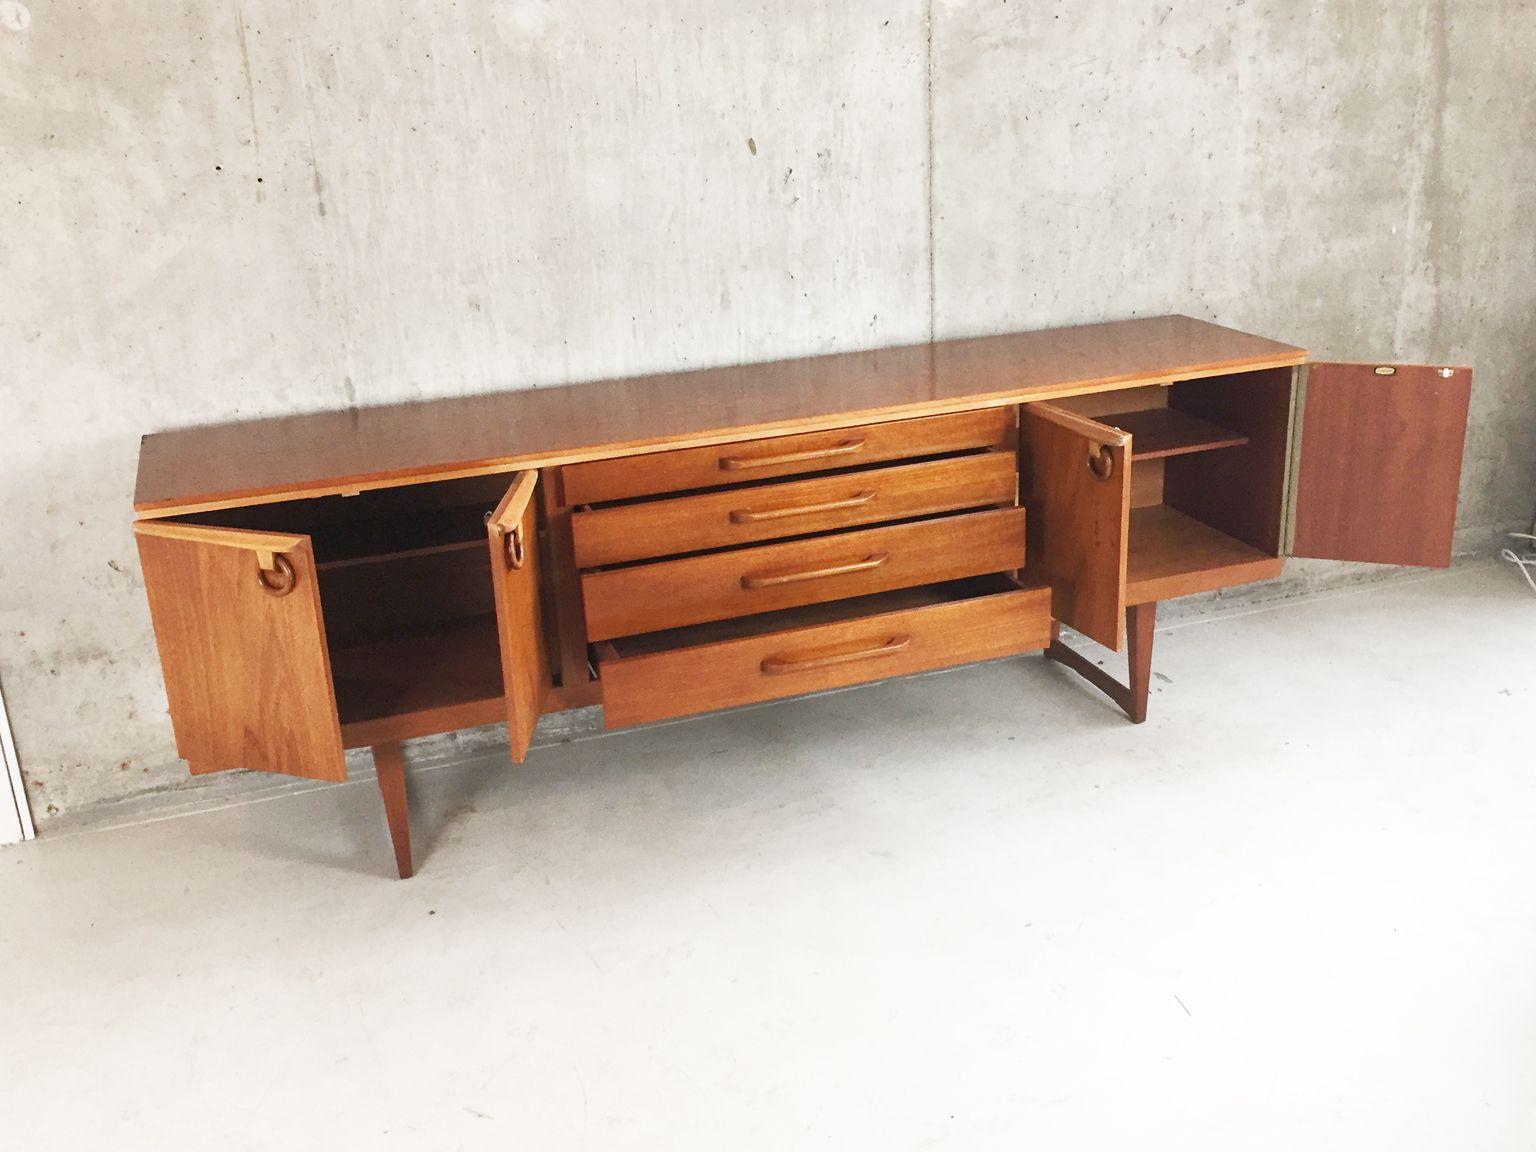 langes sideboard mit ringf rmigen handgriffen von. Black Bedroom Furniture Sets. Home Design Ideas